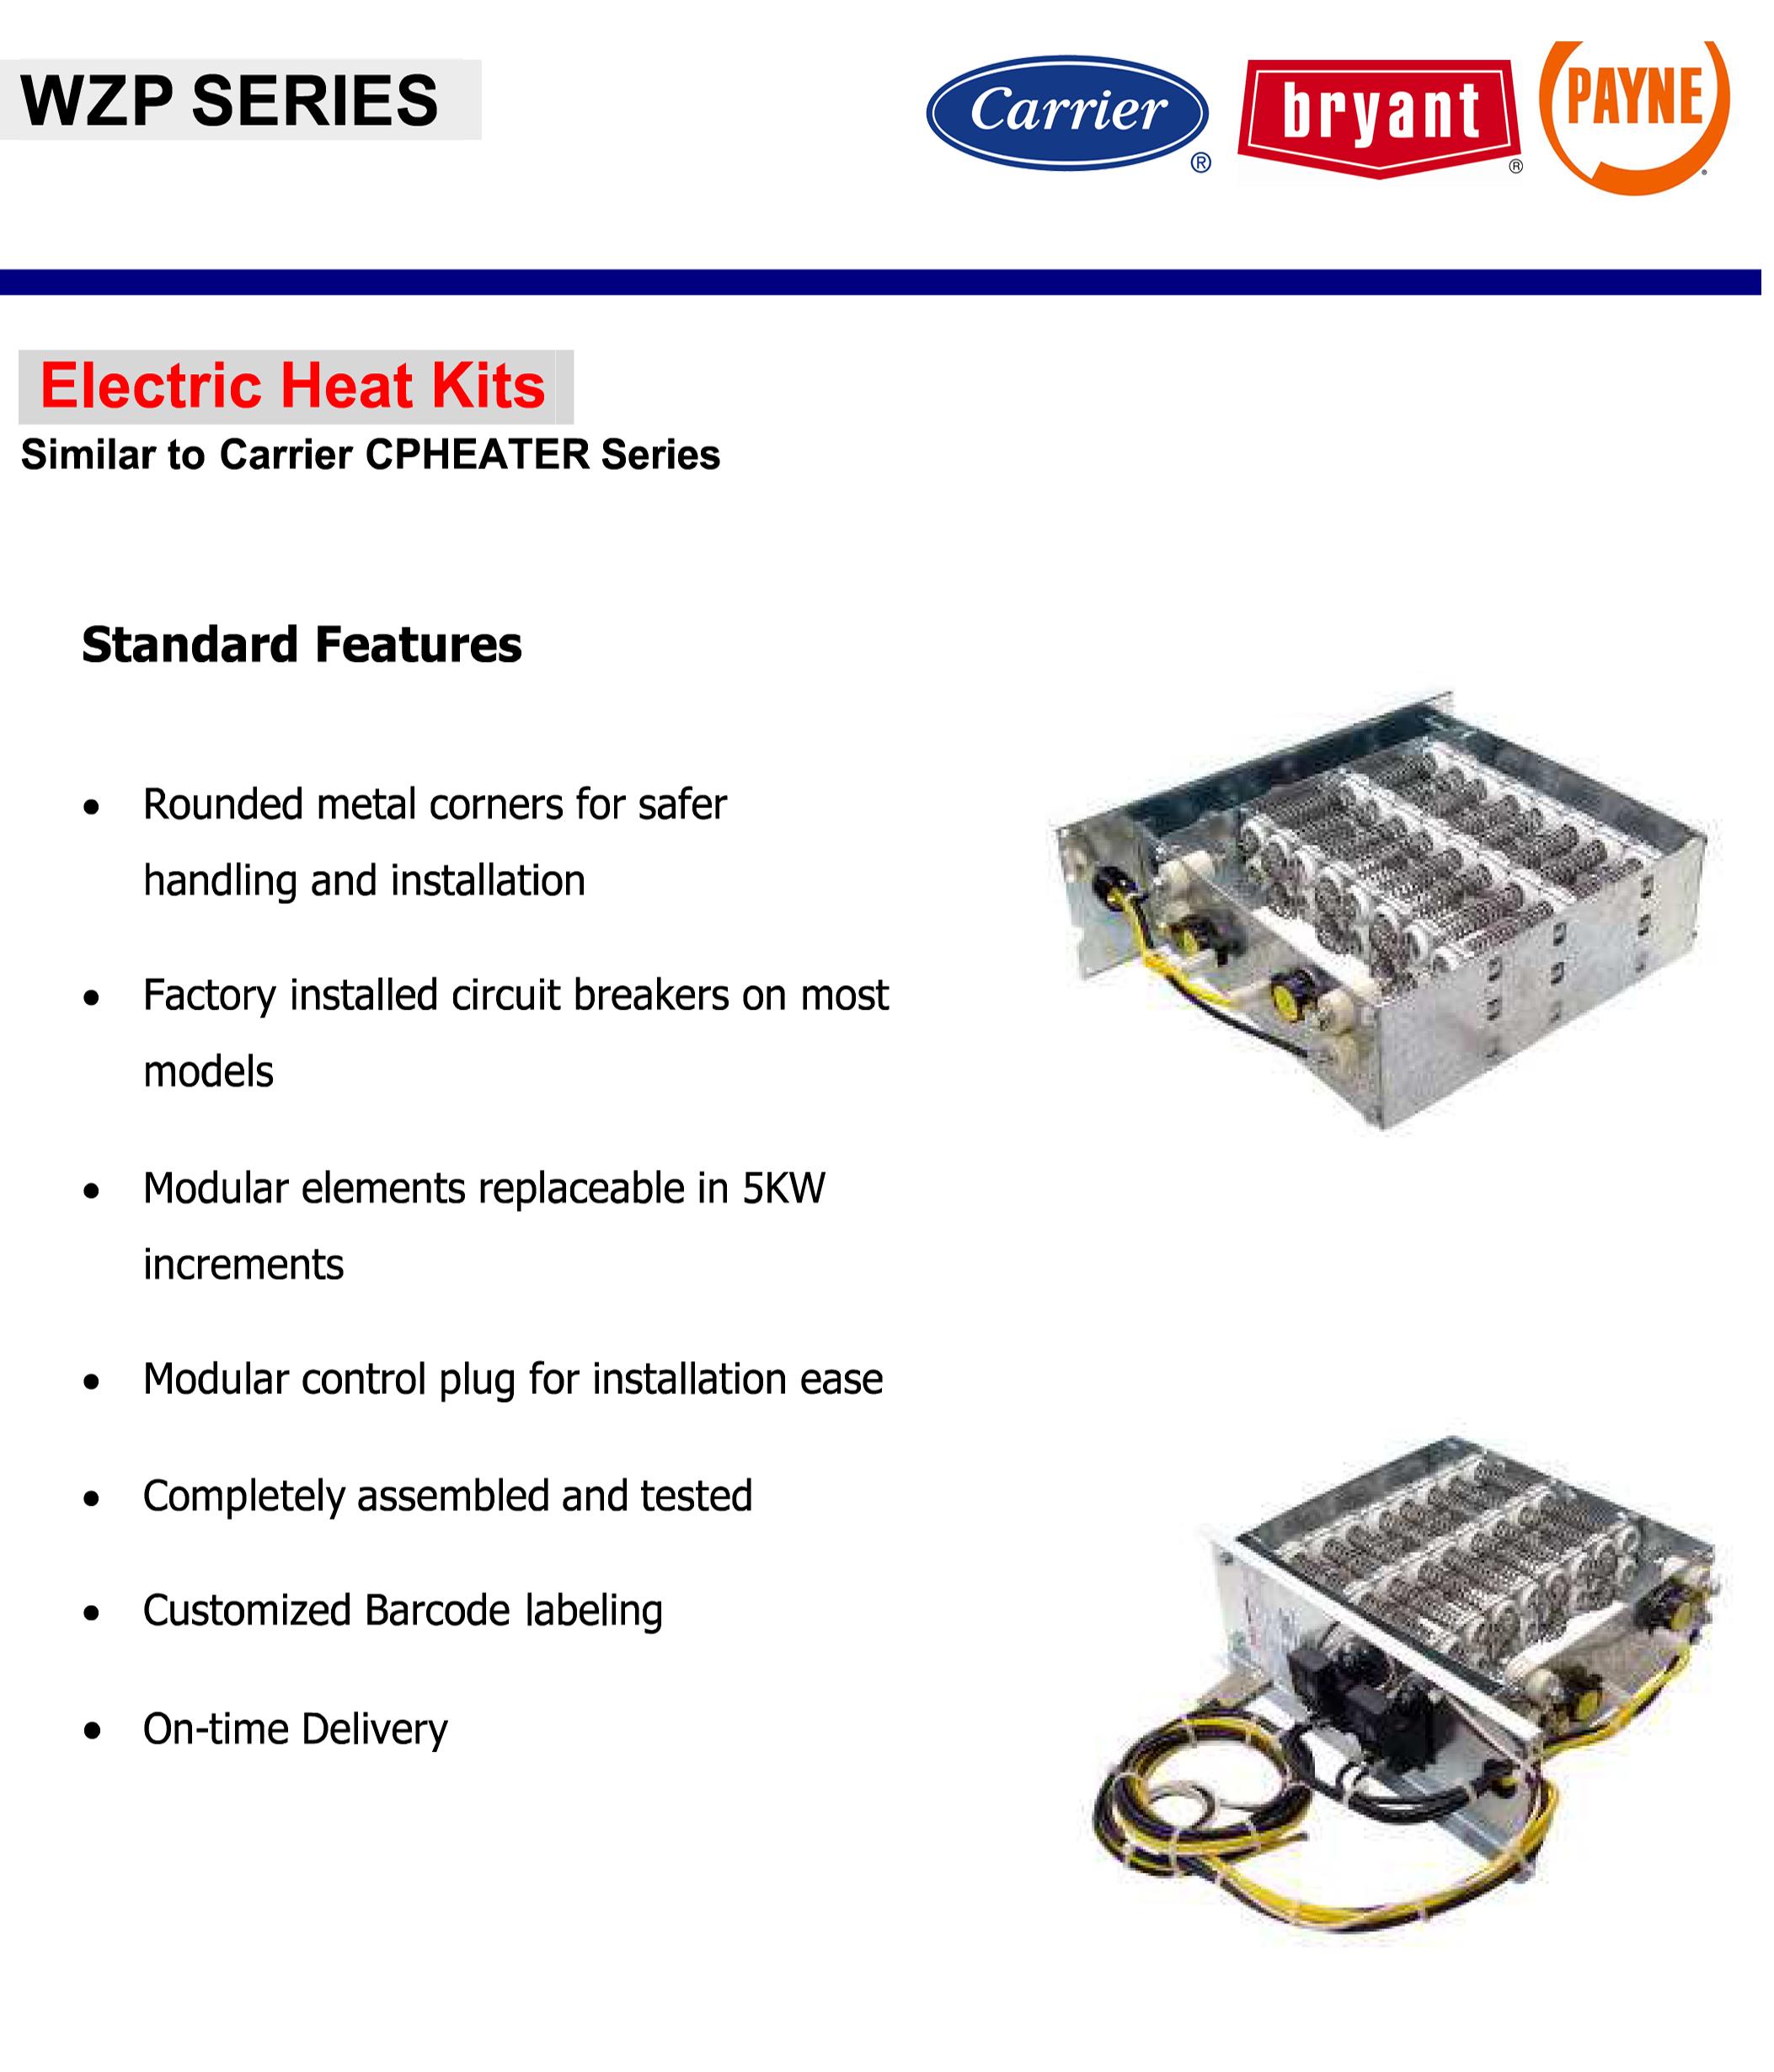 10 Kw Heat Strip For Carrier  Bryant  Payne Package Units 50zp  50zh  Pa1z  Ph1z  564a  664a Wzp1002